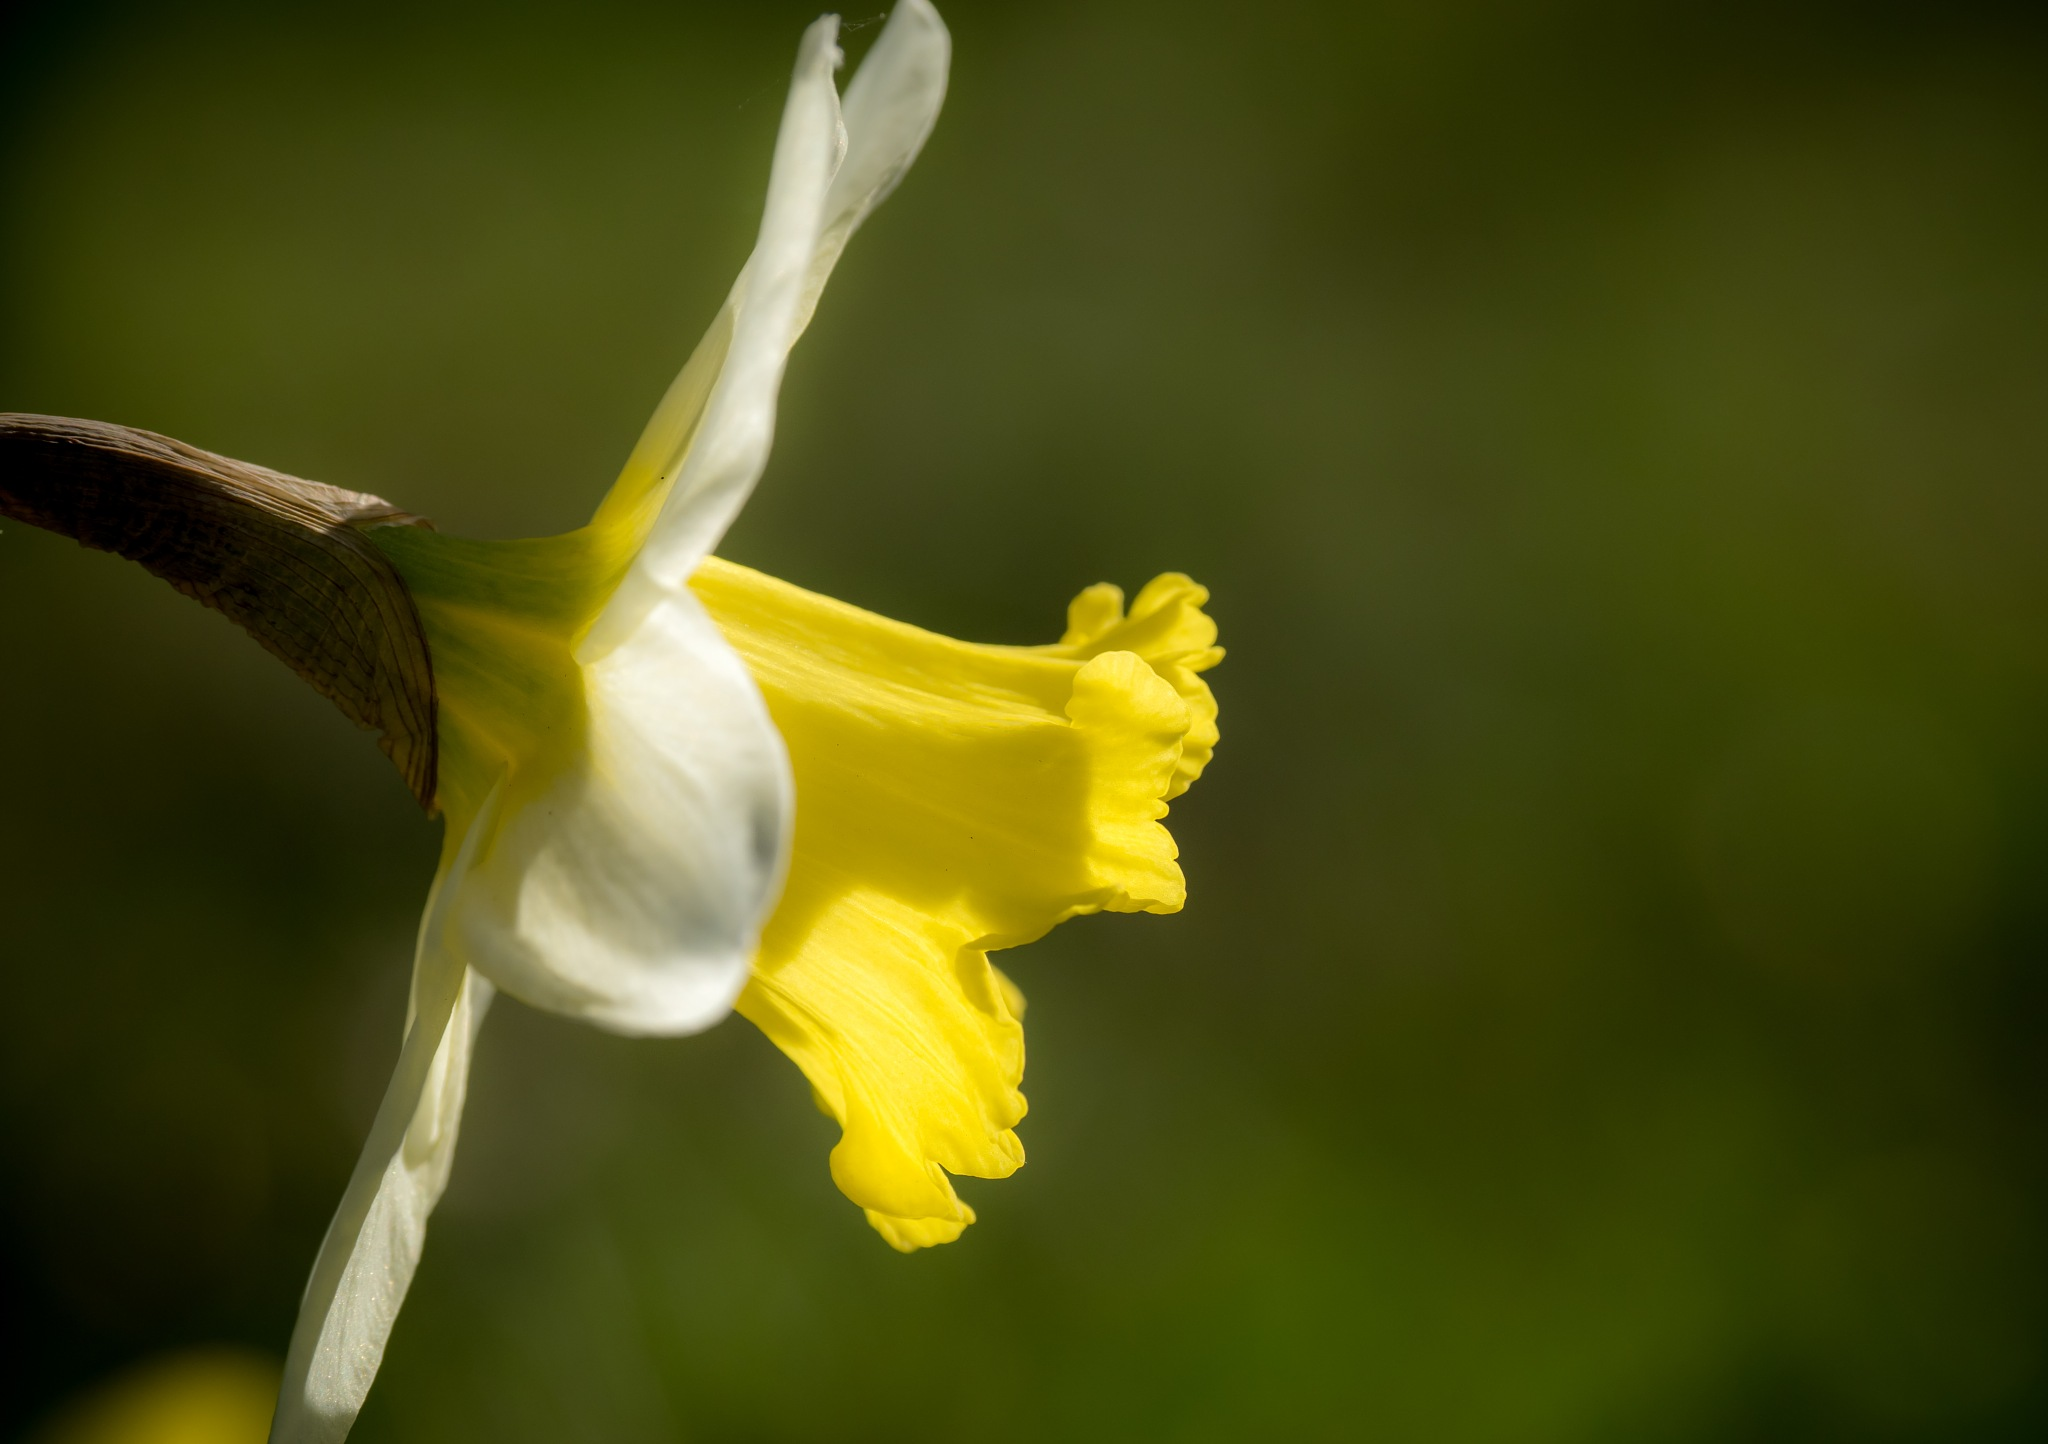 Daffodil by Sarah Walters